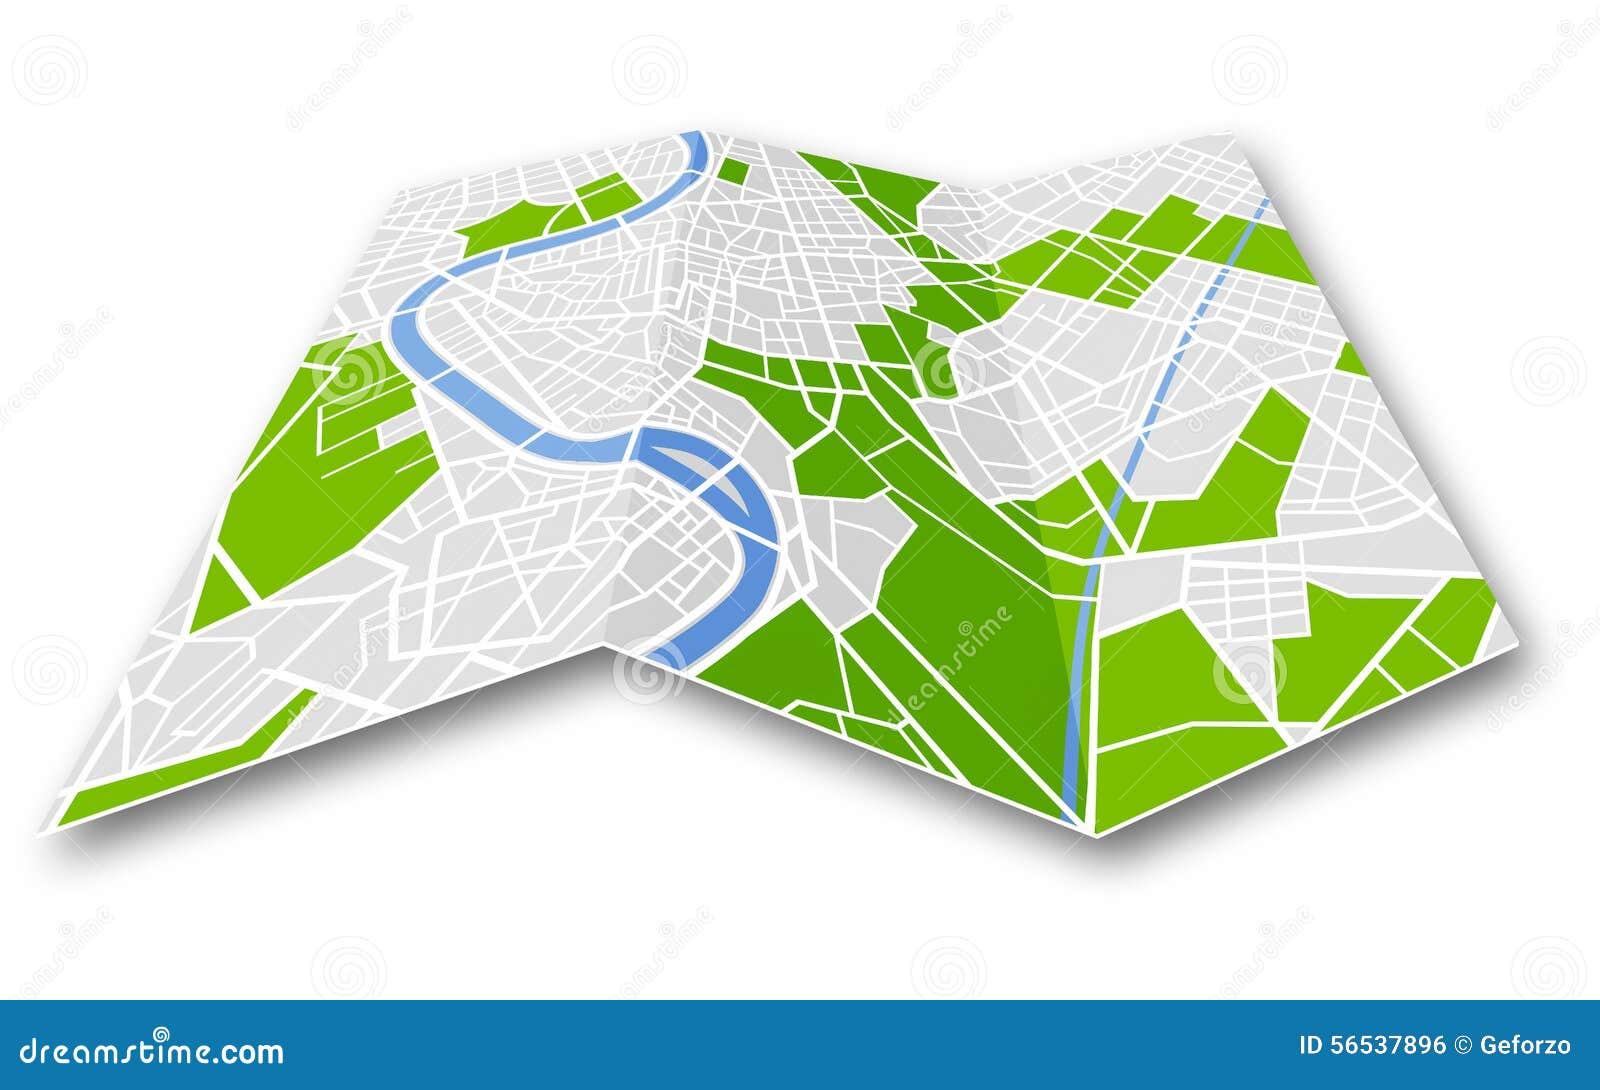 Folded generic city map